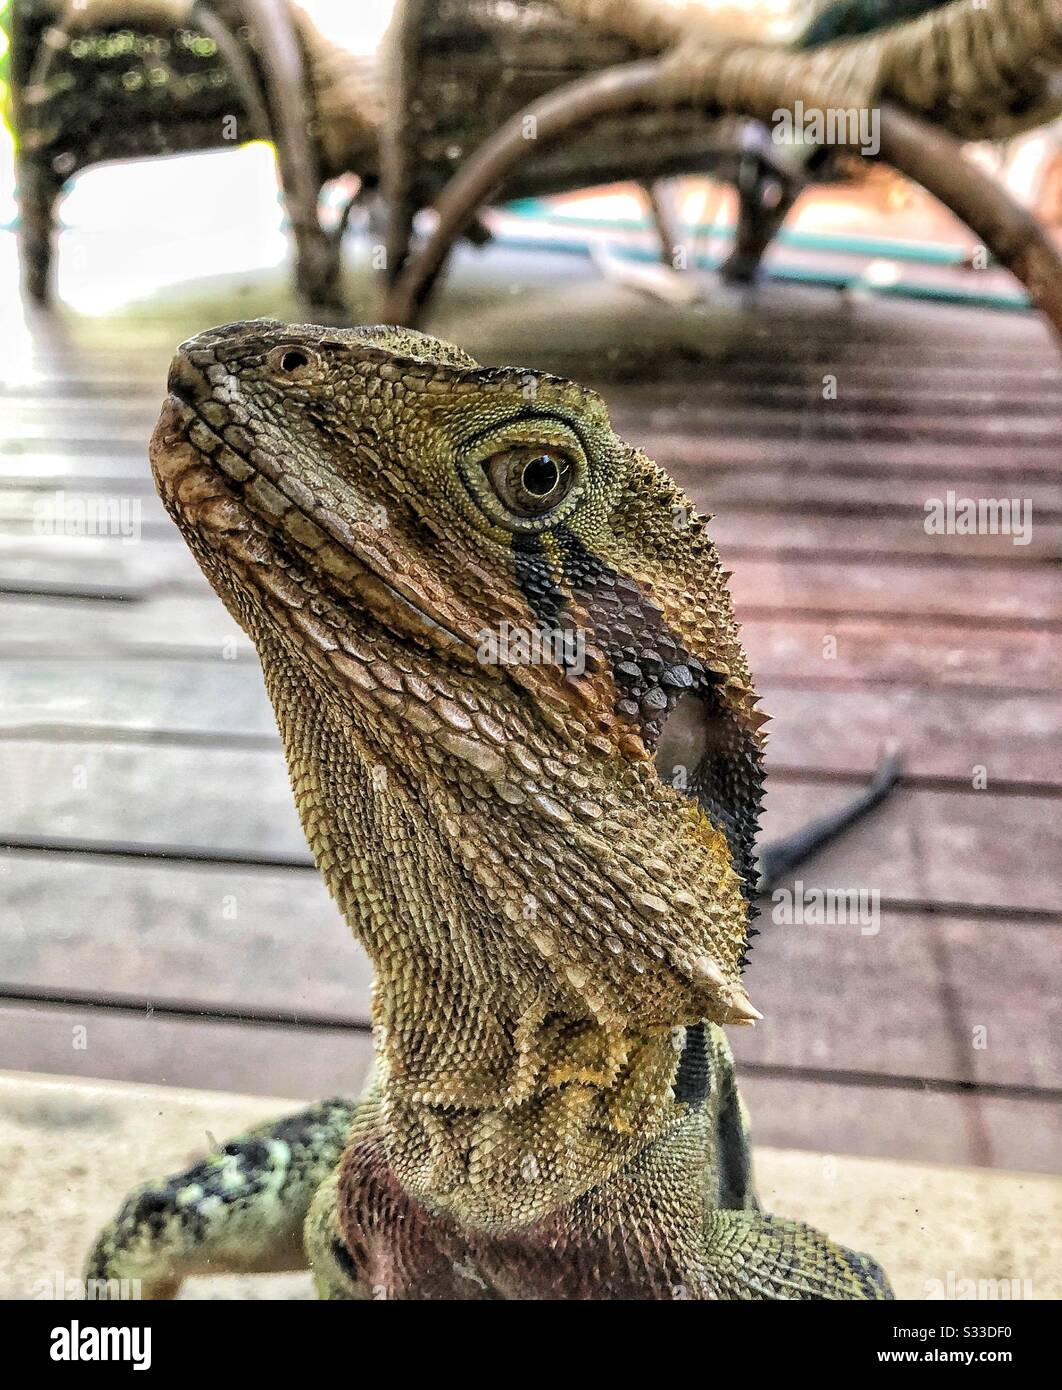 Dragón De Agua Australiano - Physignathus Lesueurii Foto de stock